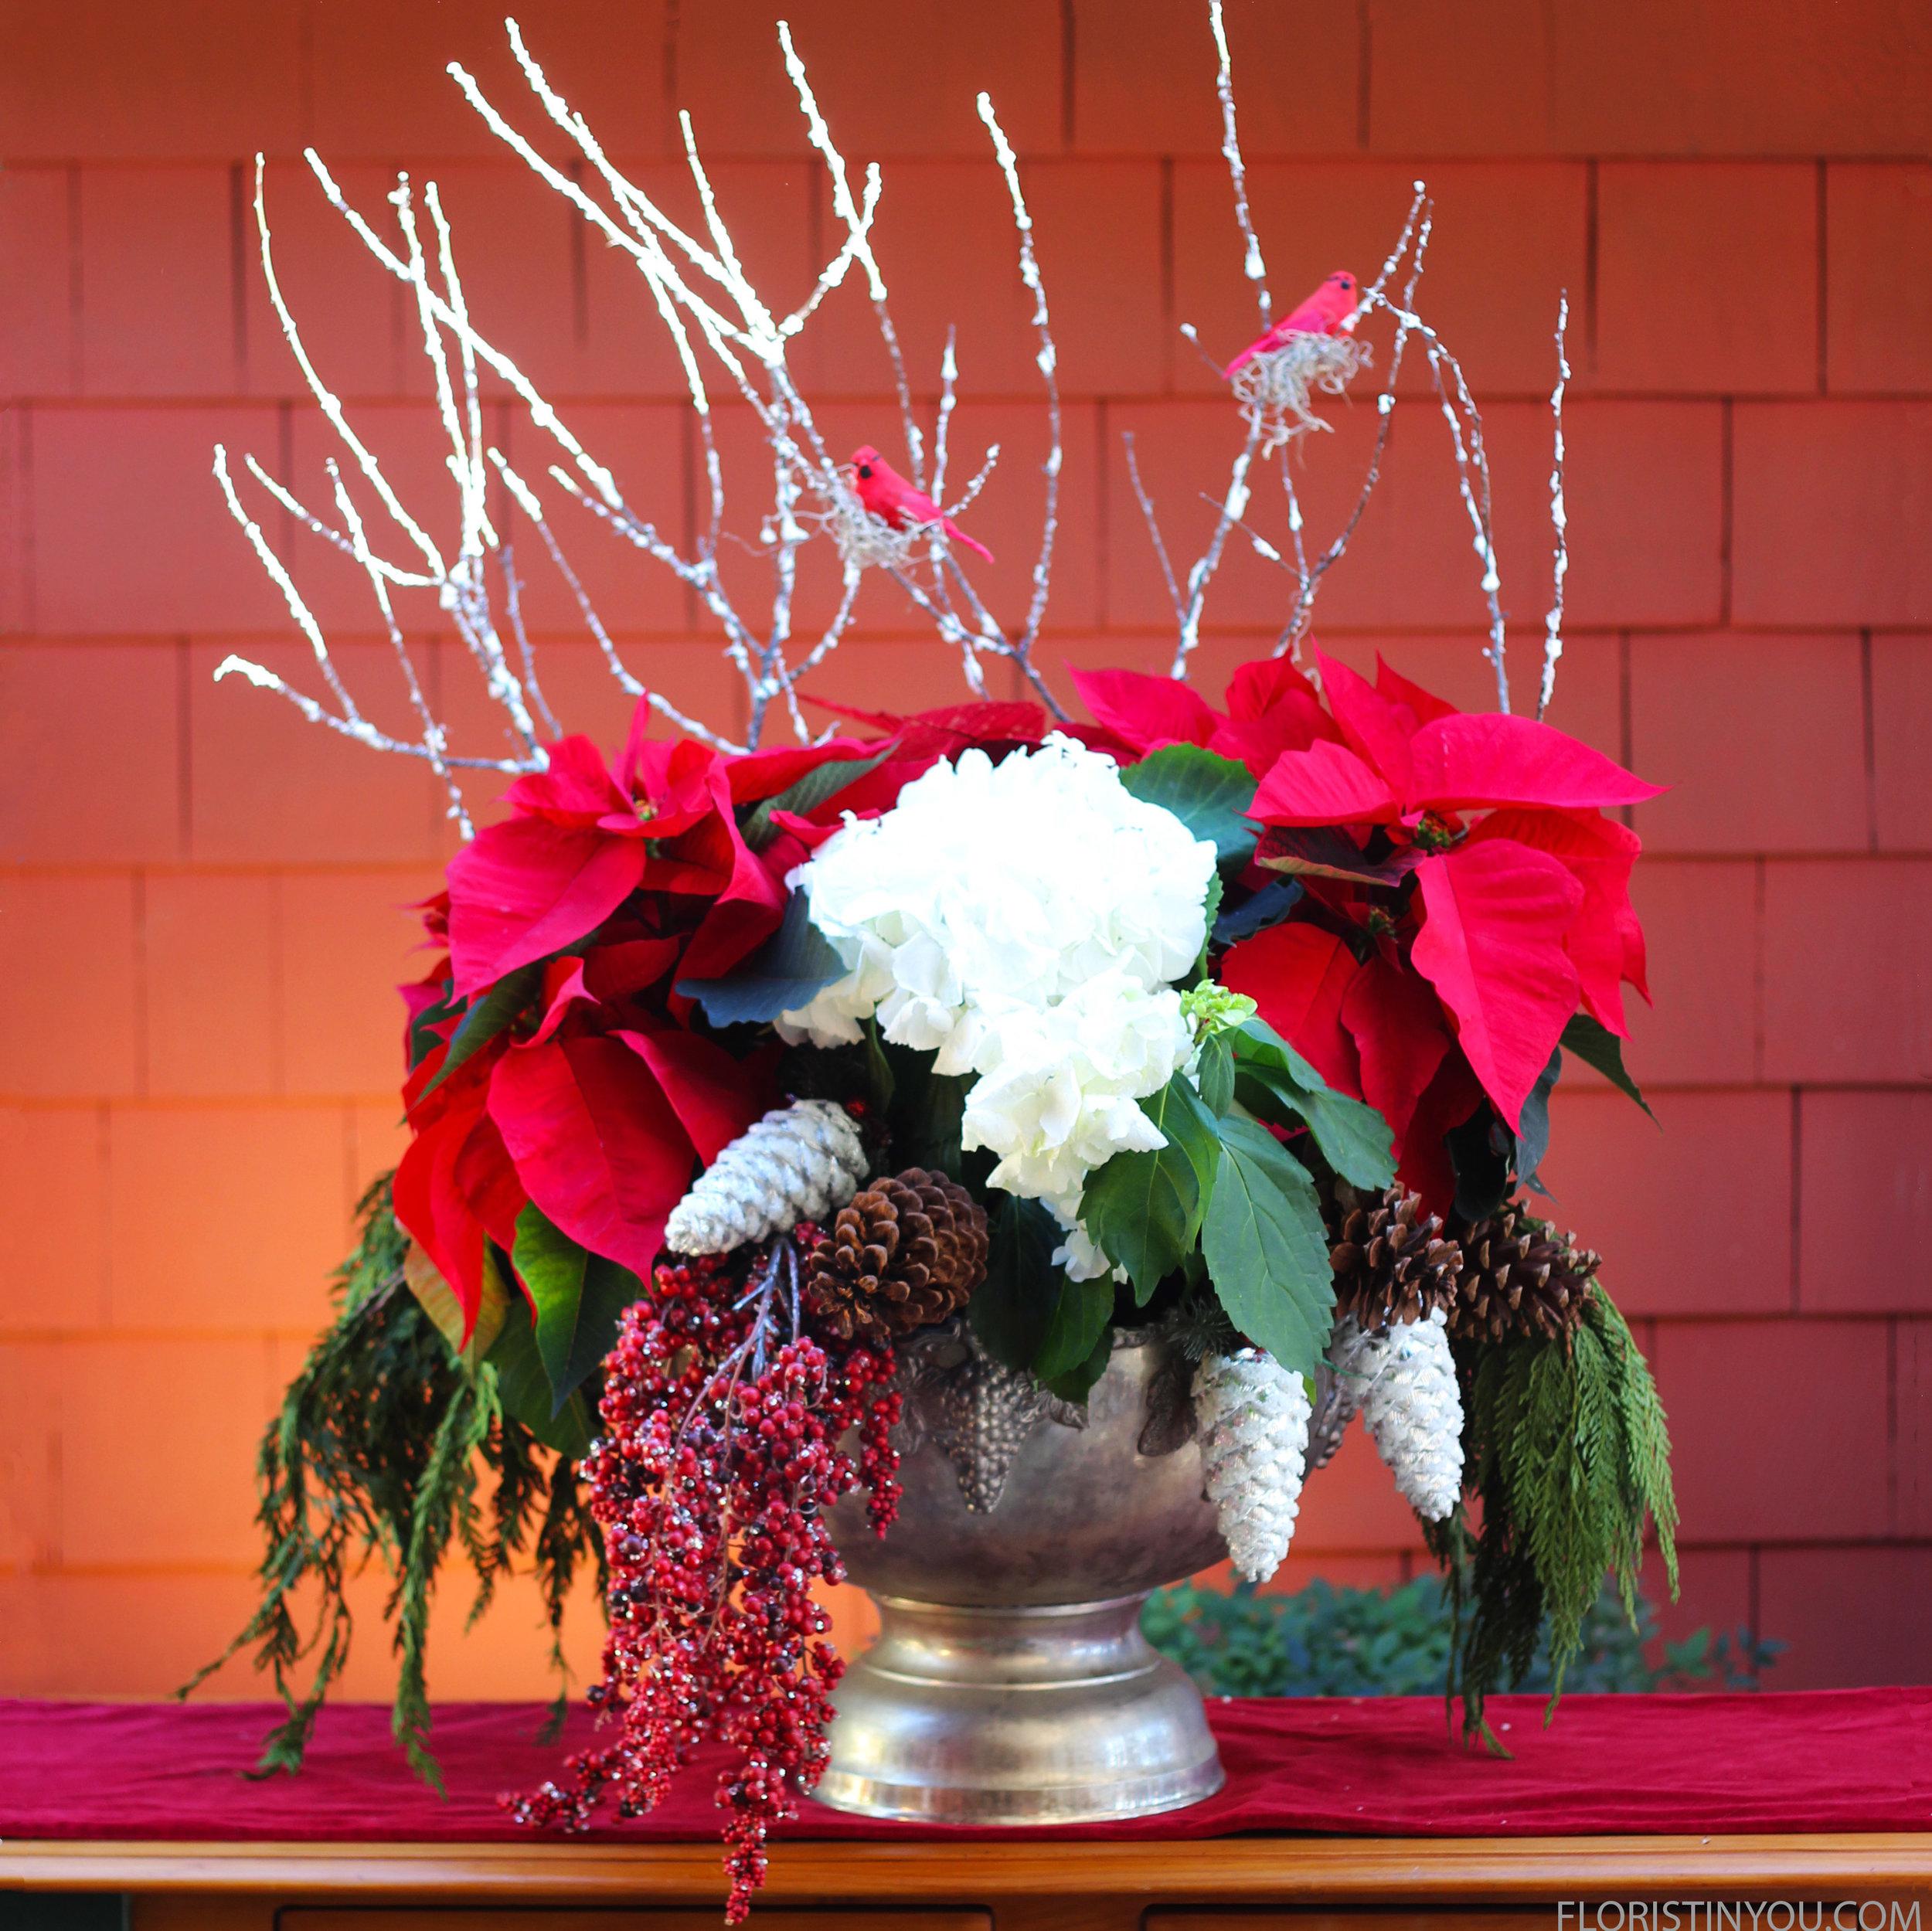 Christmas Poinsettias and Hydrangea